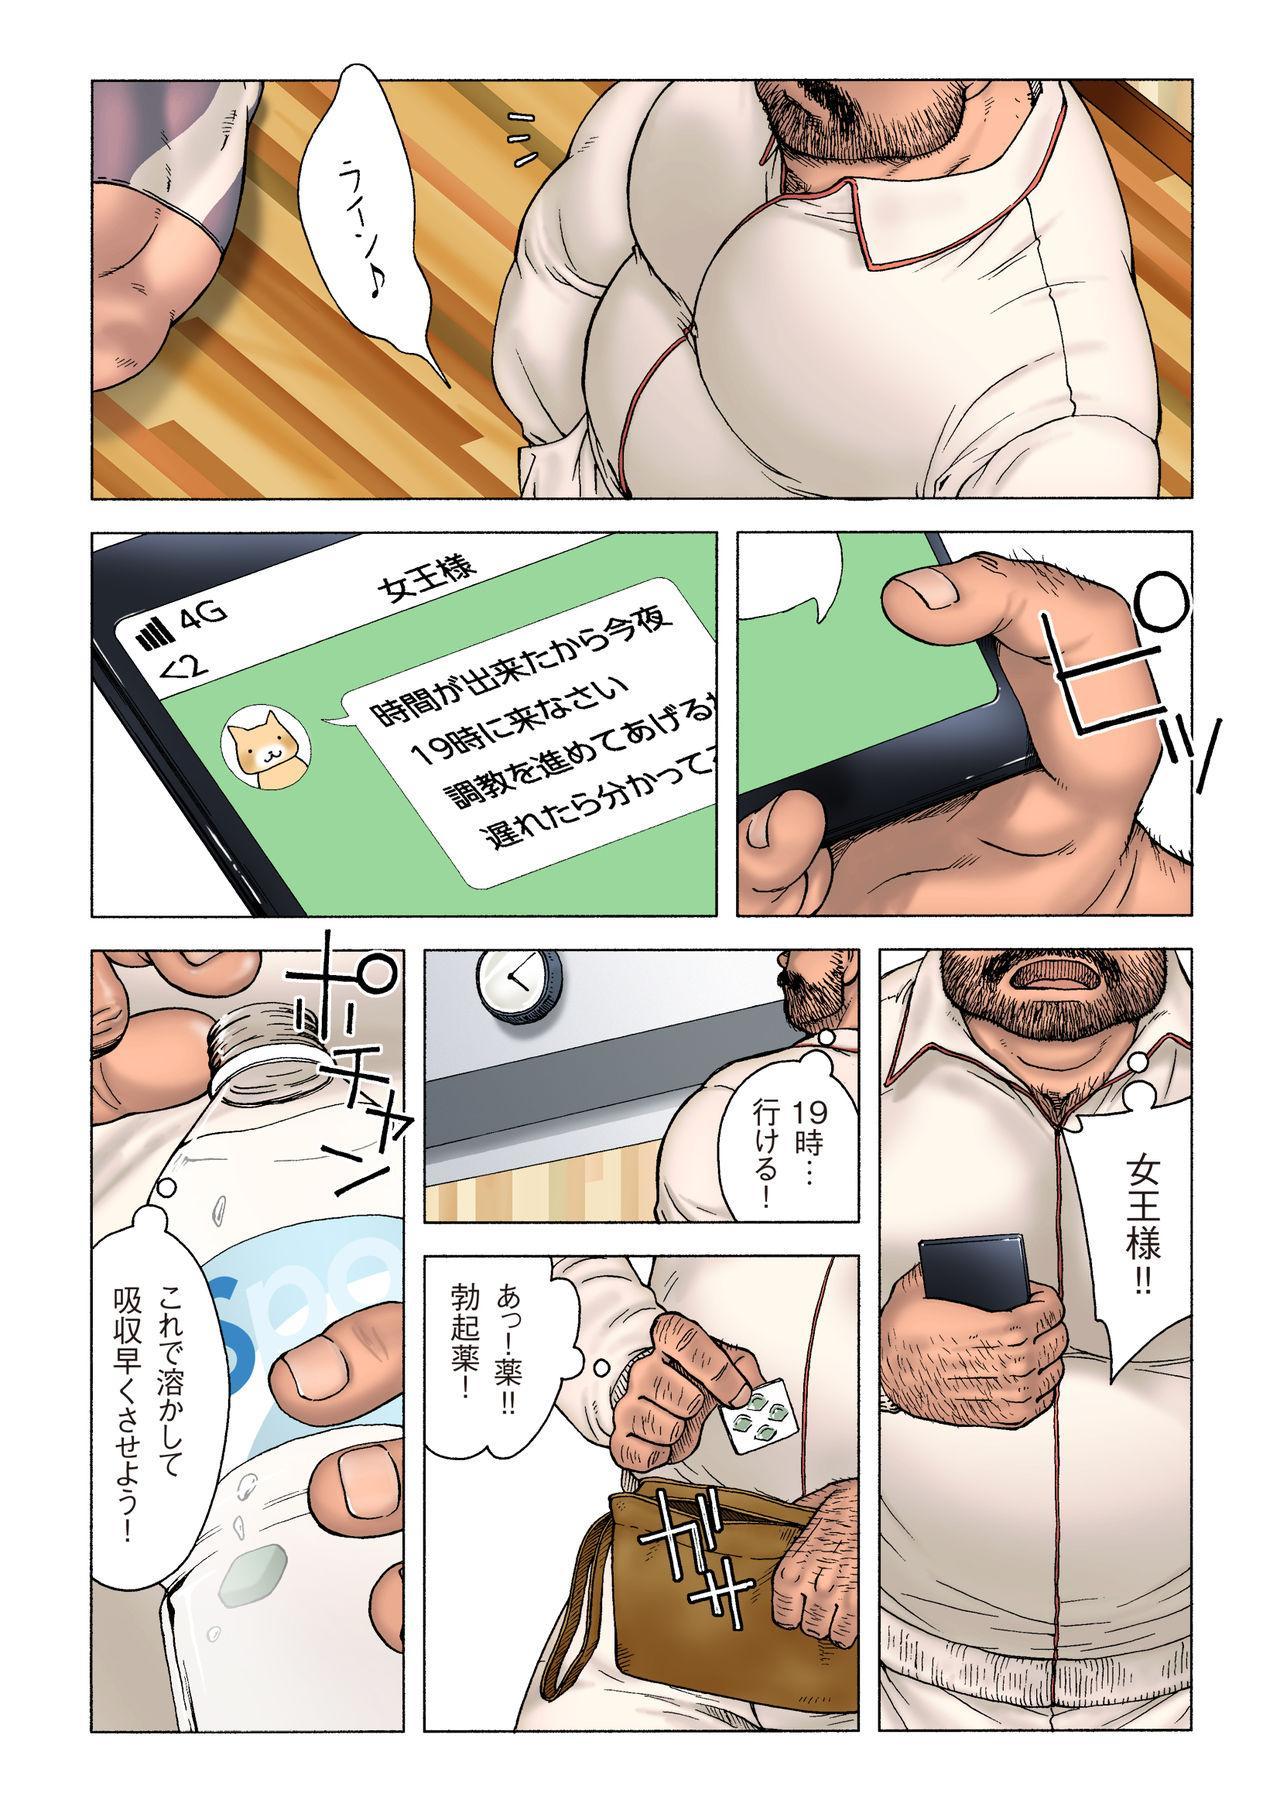 Danshi Koukousei Weightlifter Shiai-chuu, Osae kirenai Wakai Takeri 5